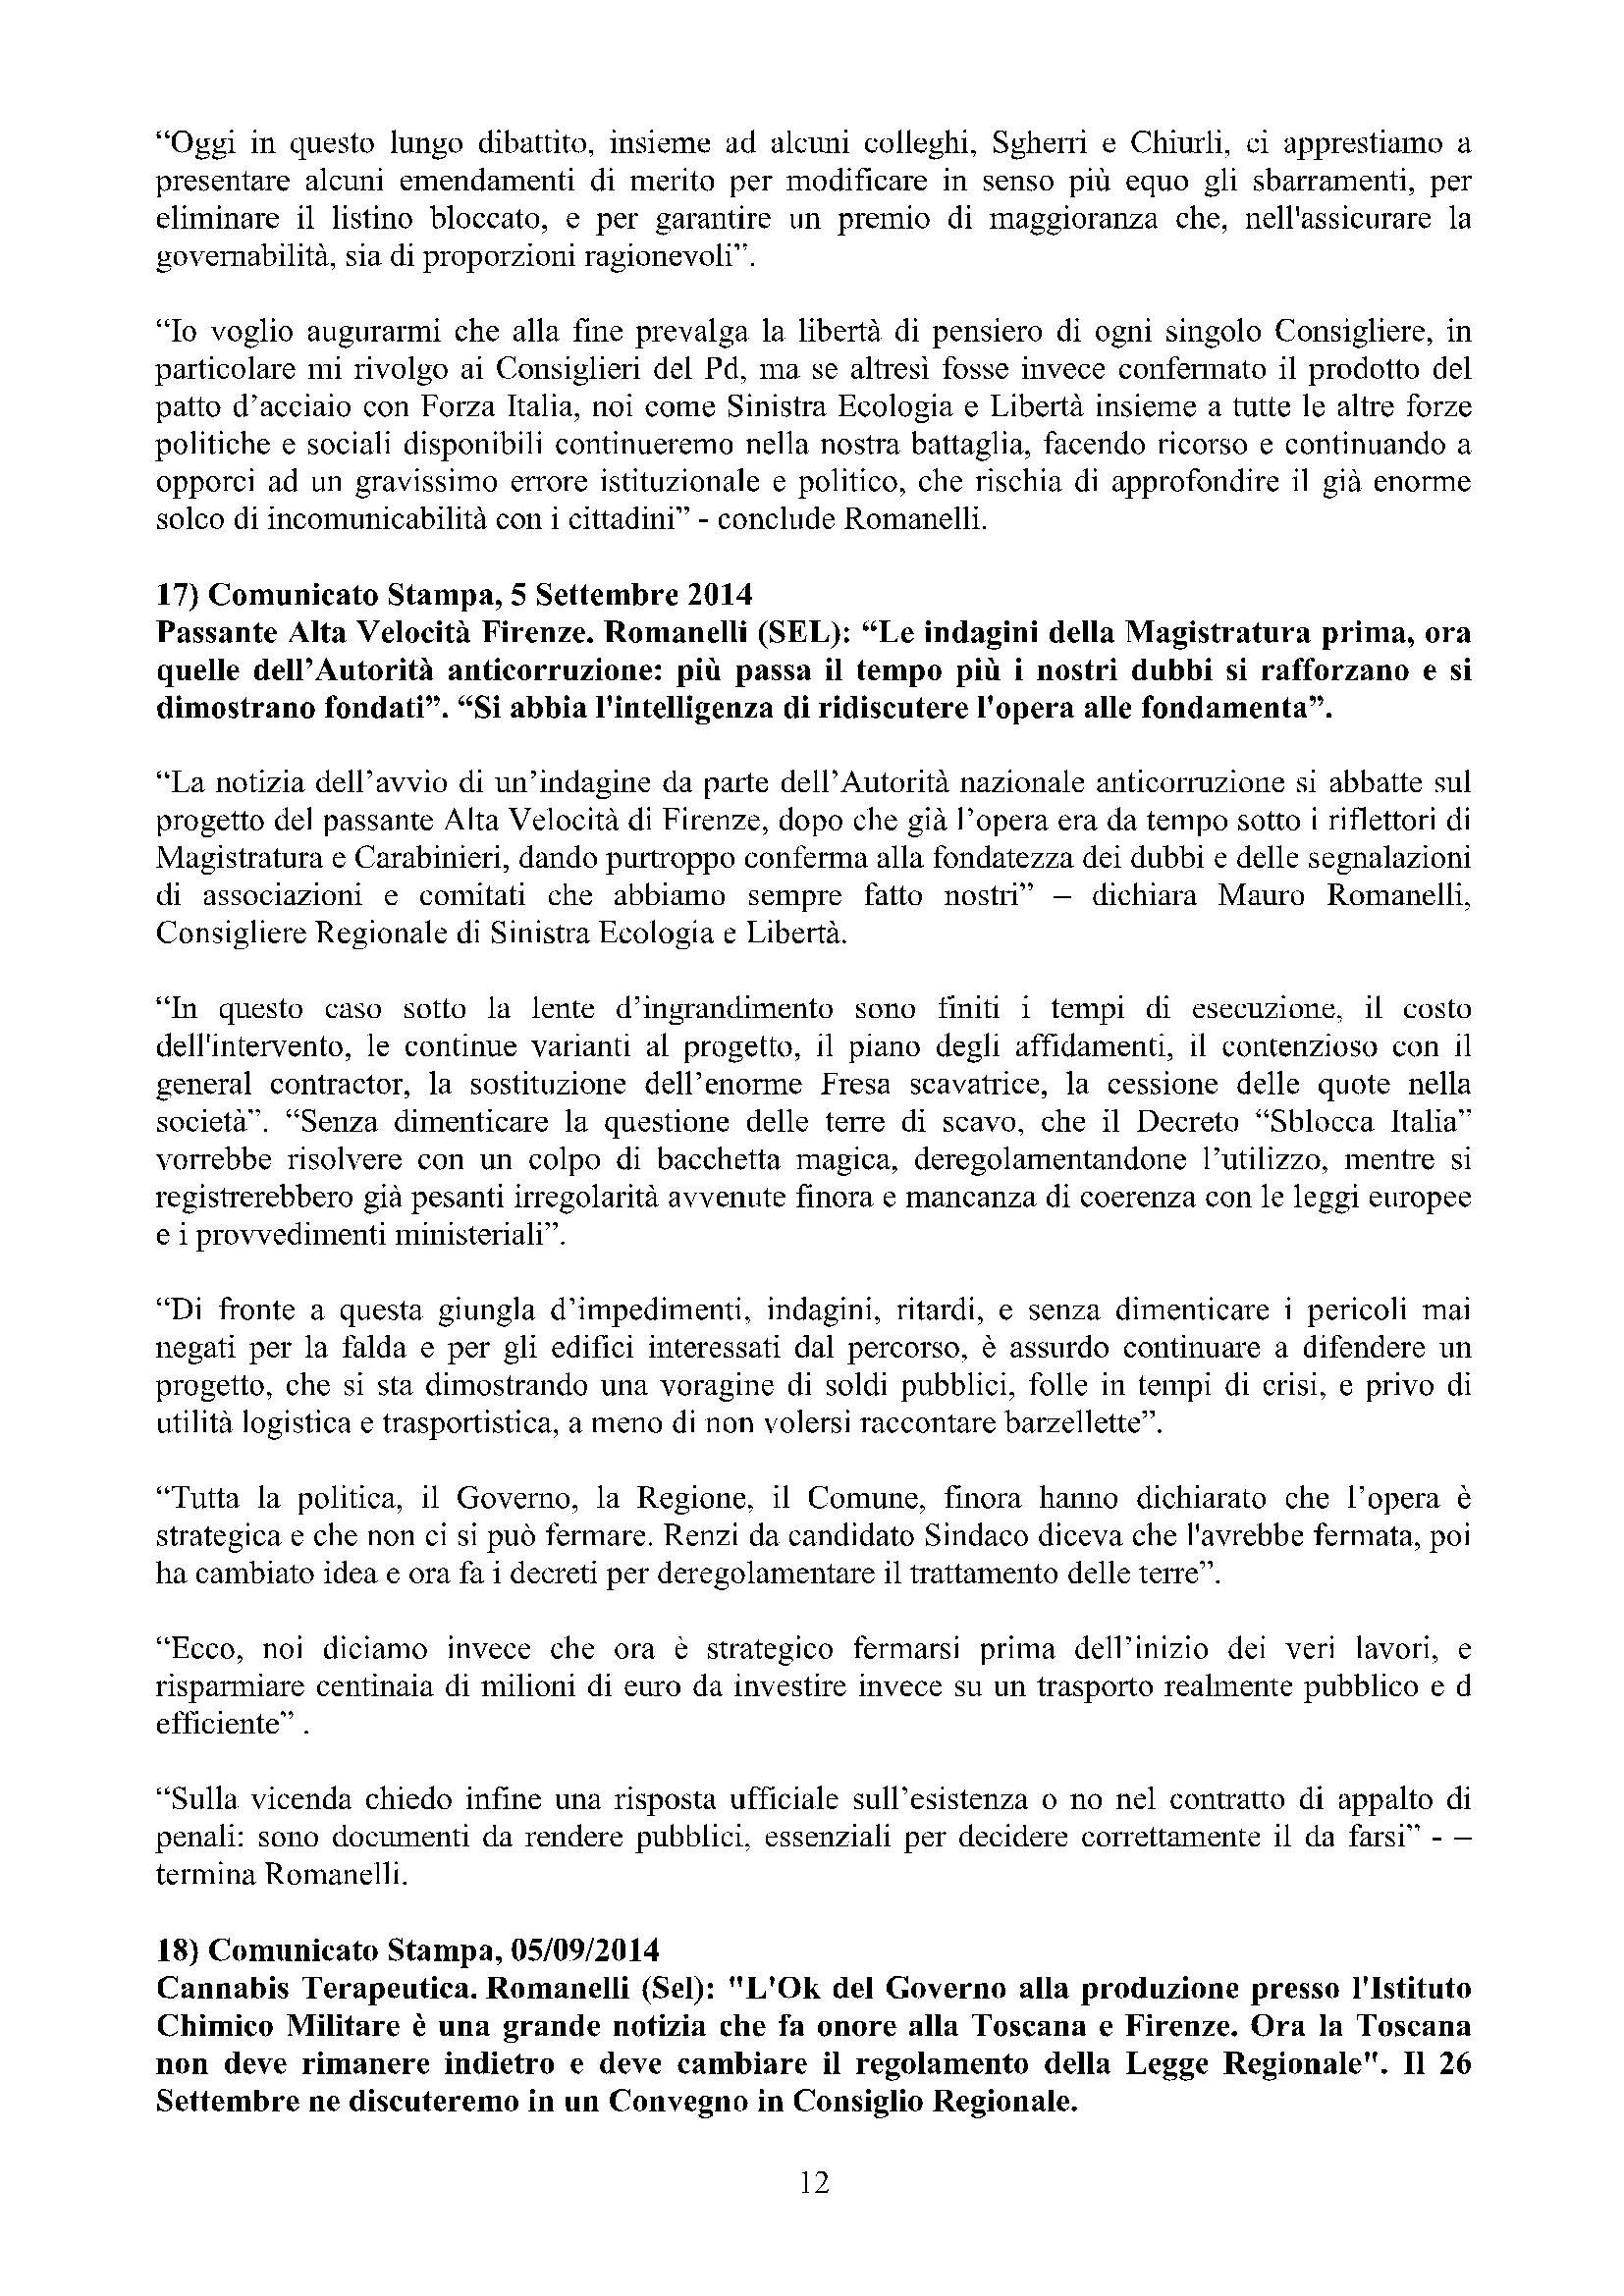 Newsletter di MAURO ROMANELLI Ottobre 2014 – 12